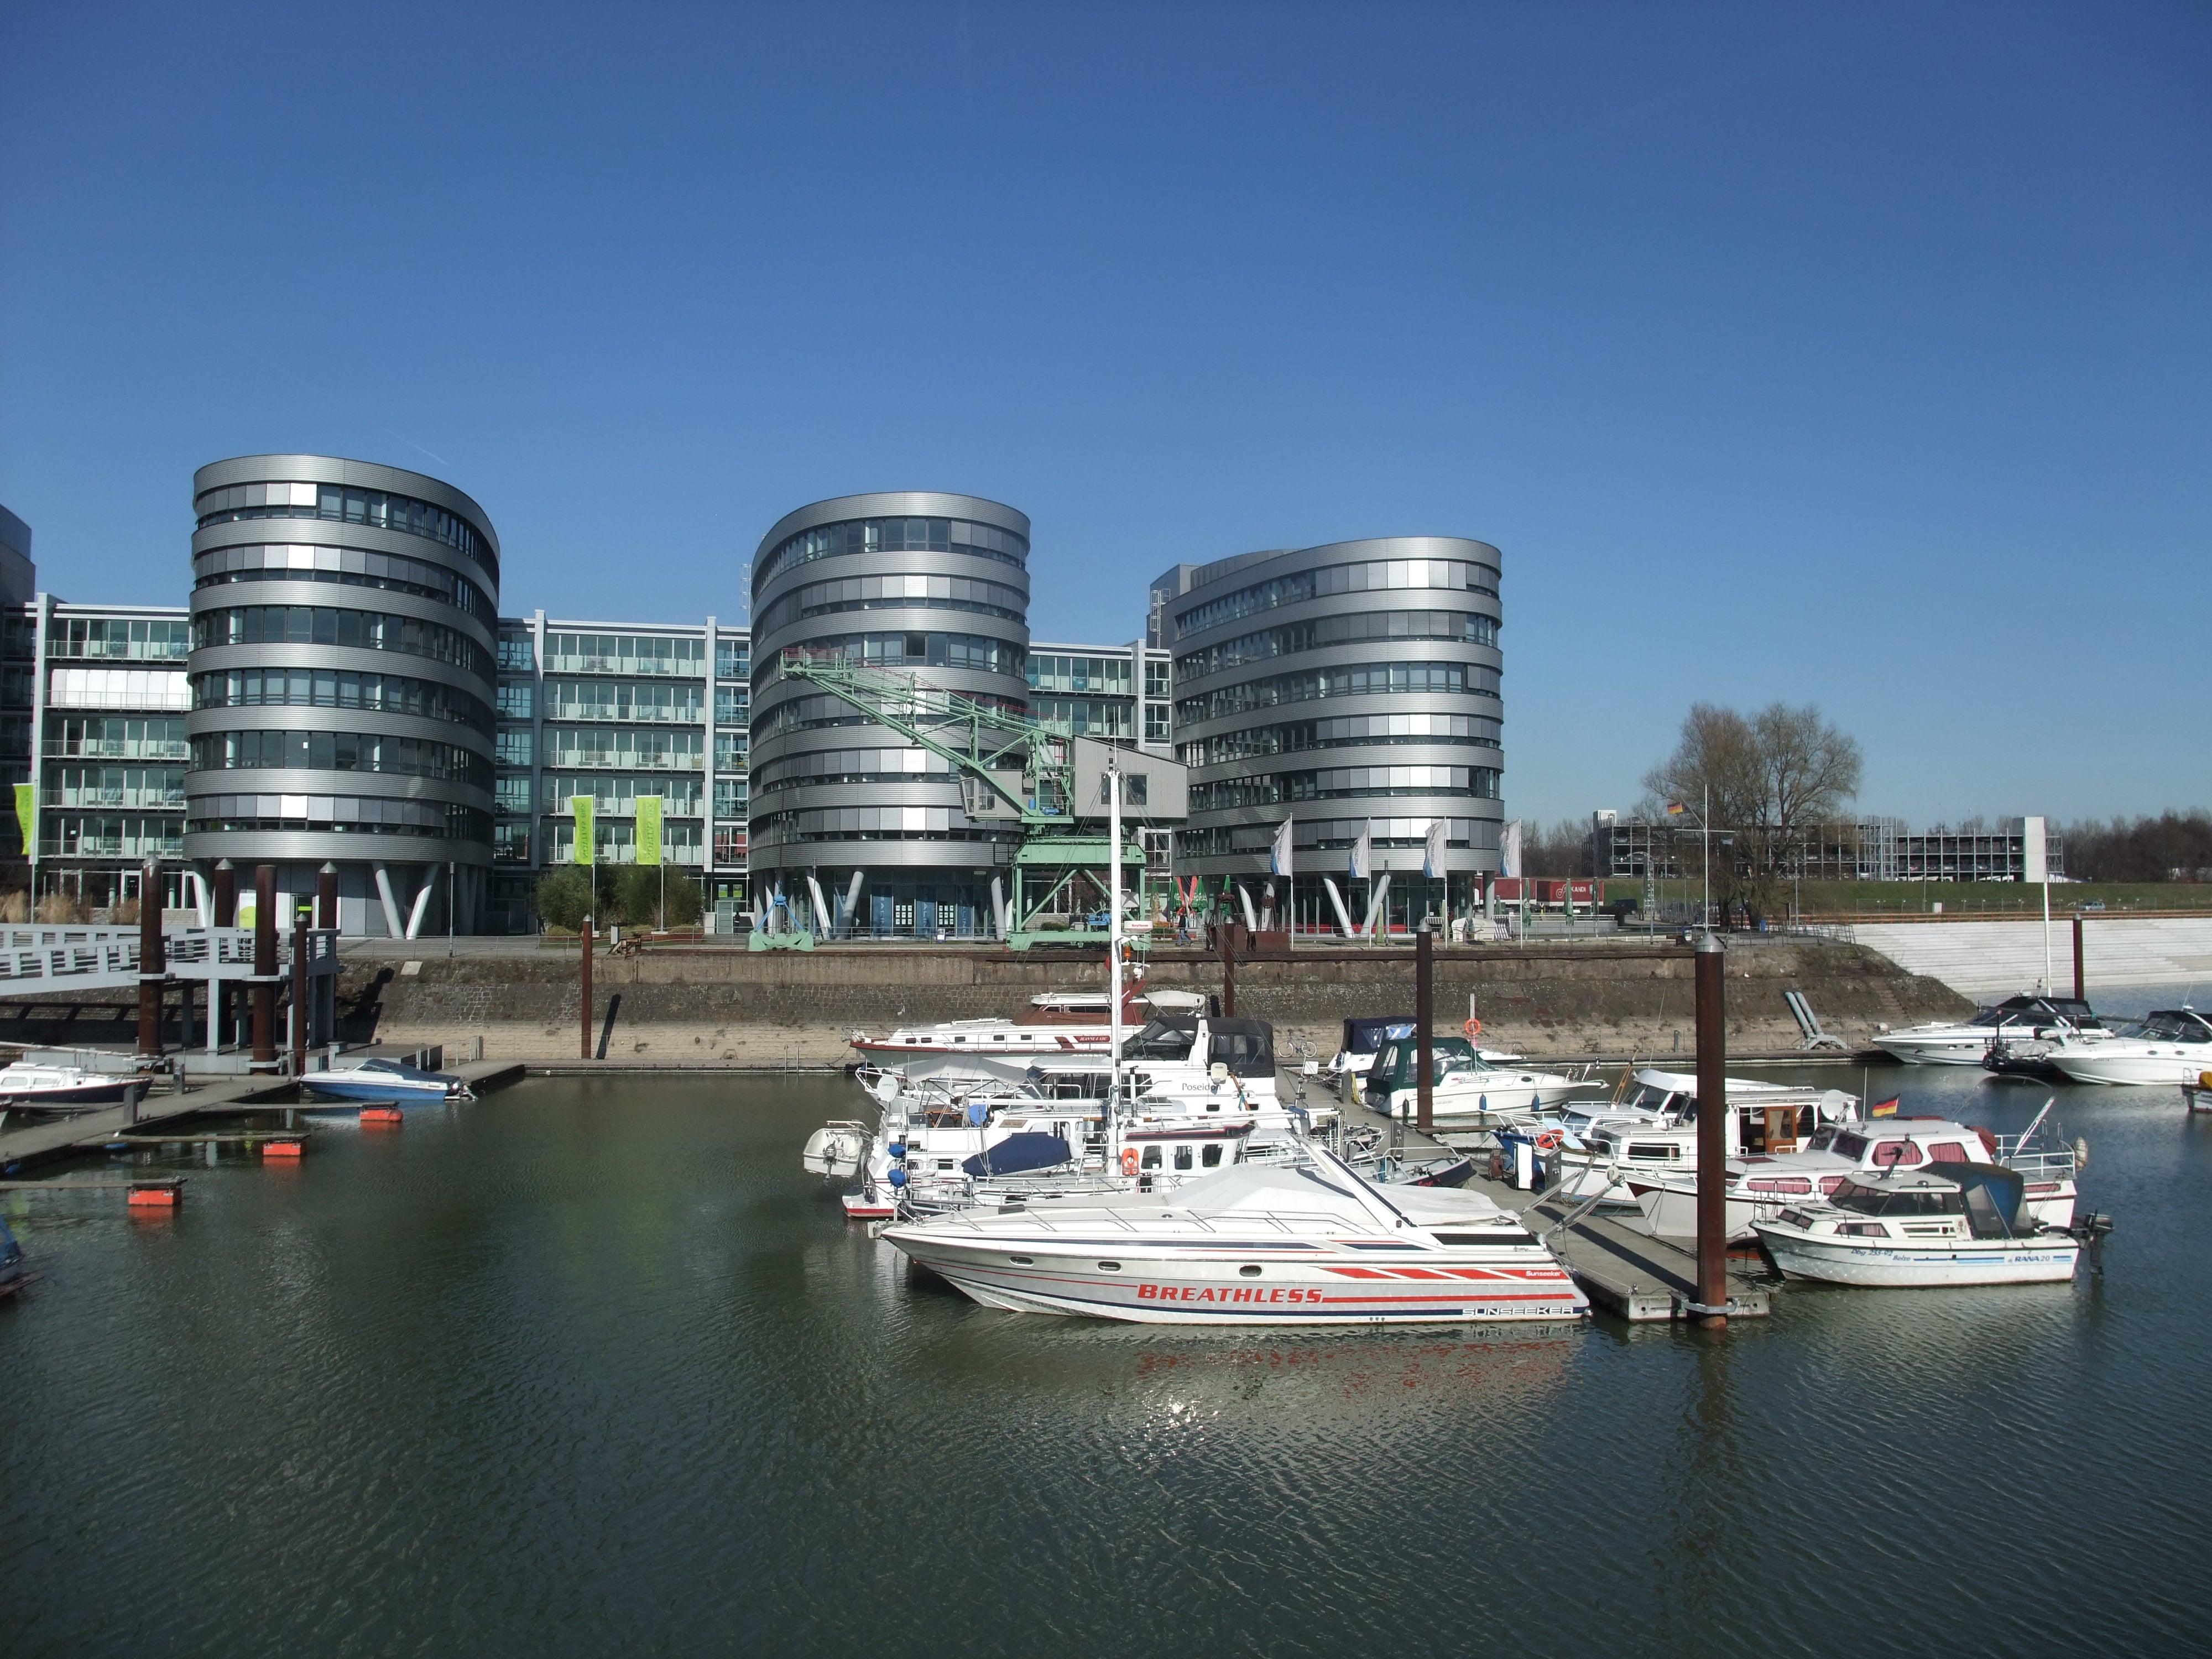 Foto: Duisburg Kontor GmbH